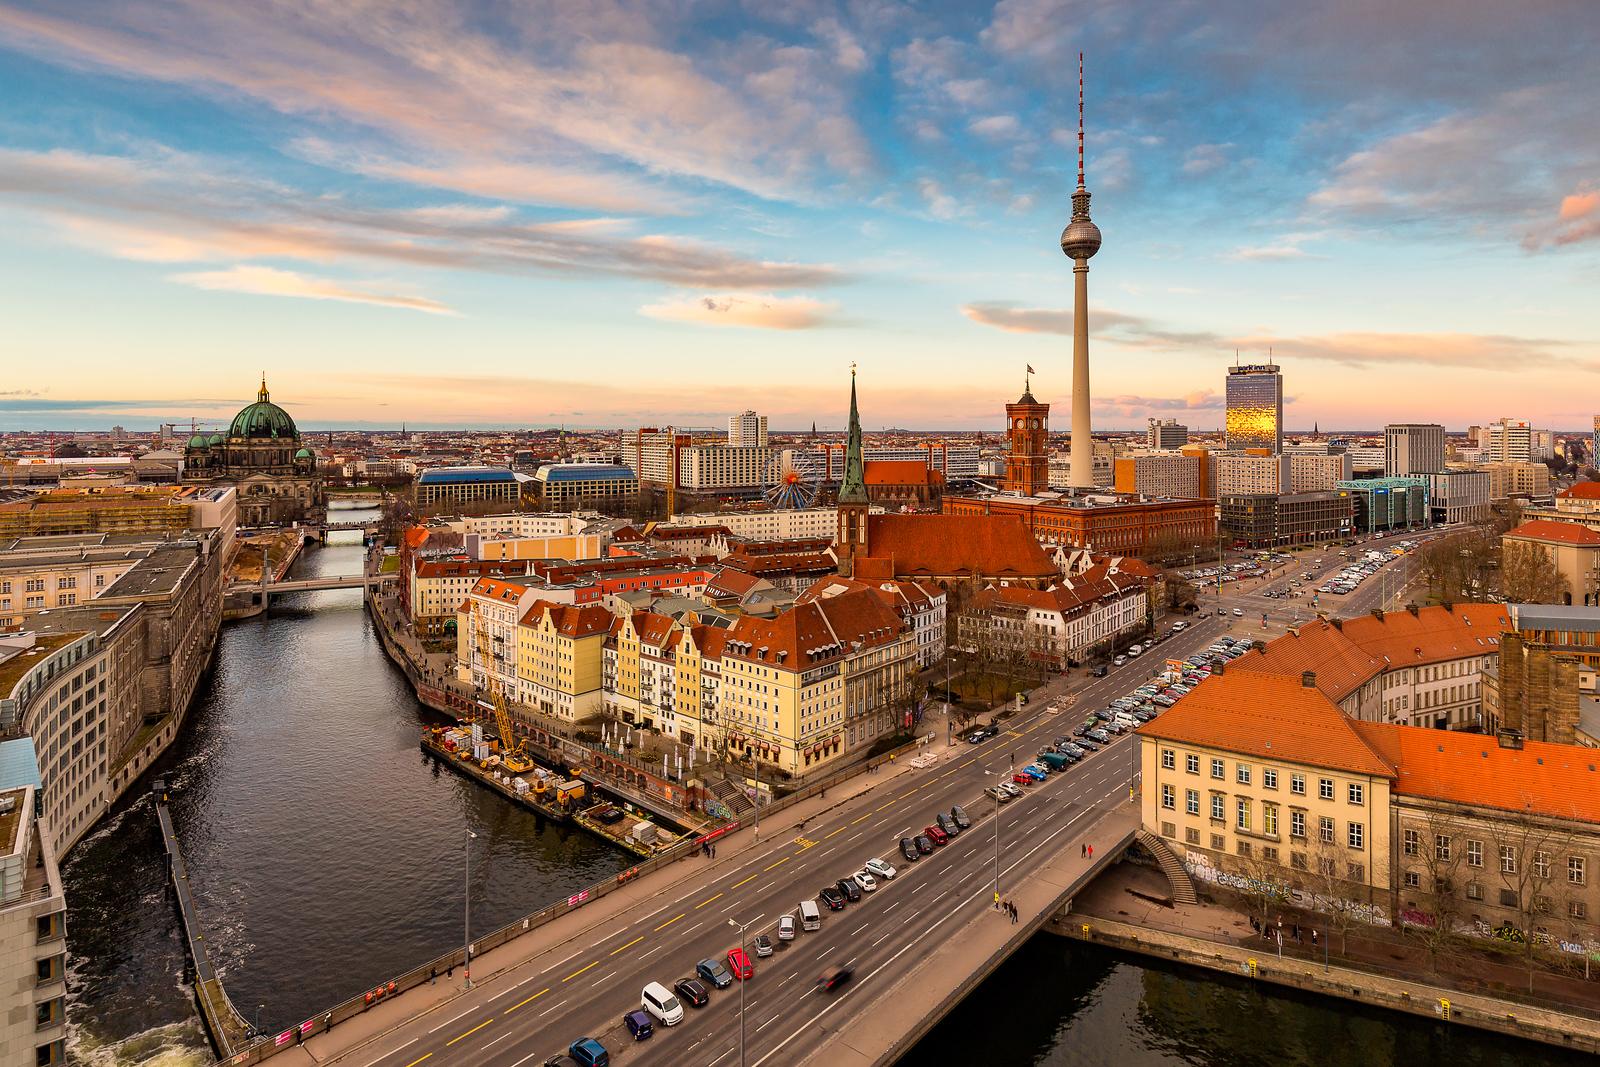 View of Berlin Mitte, Alexanderplatz and TV Tower